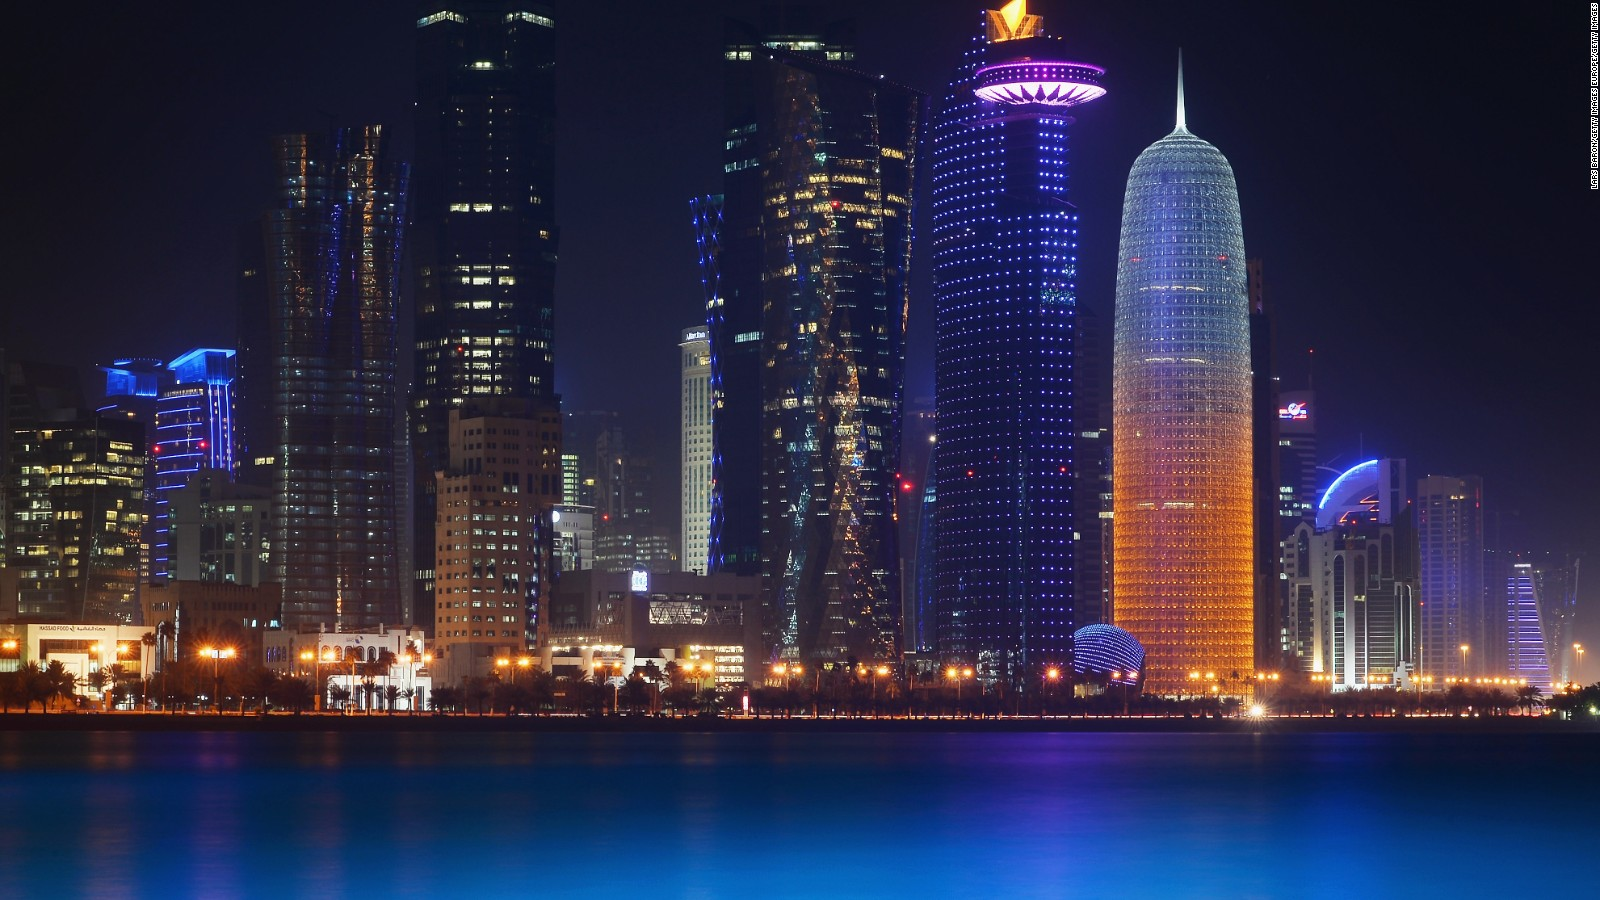 qatar - Photo